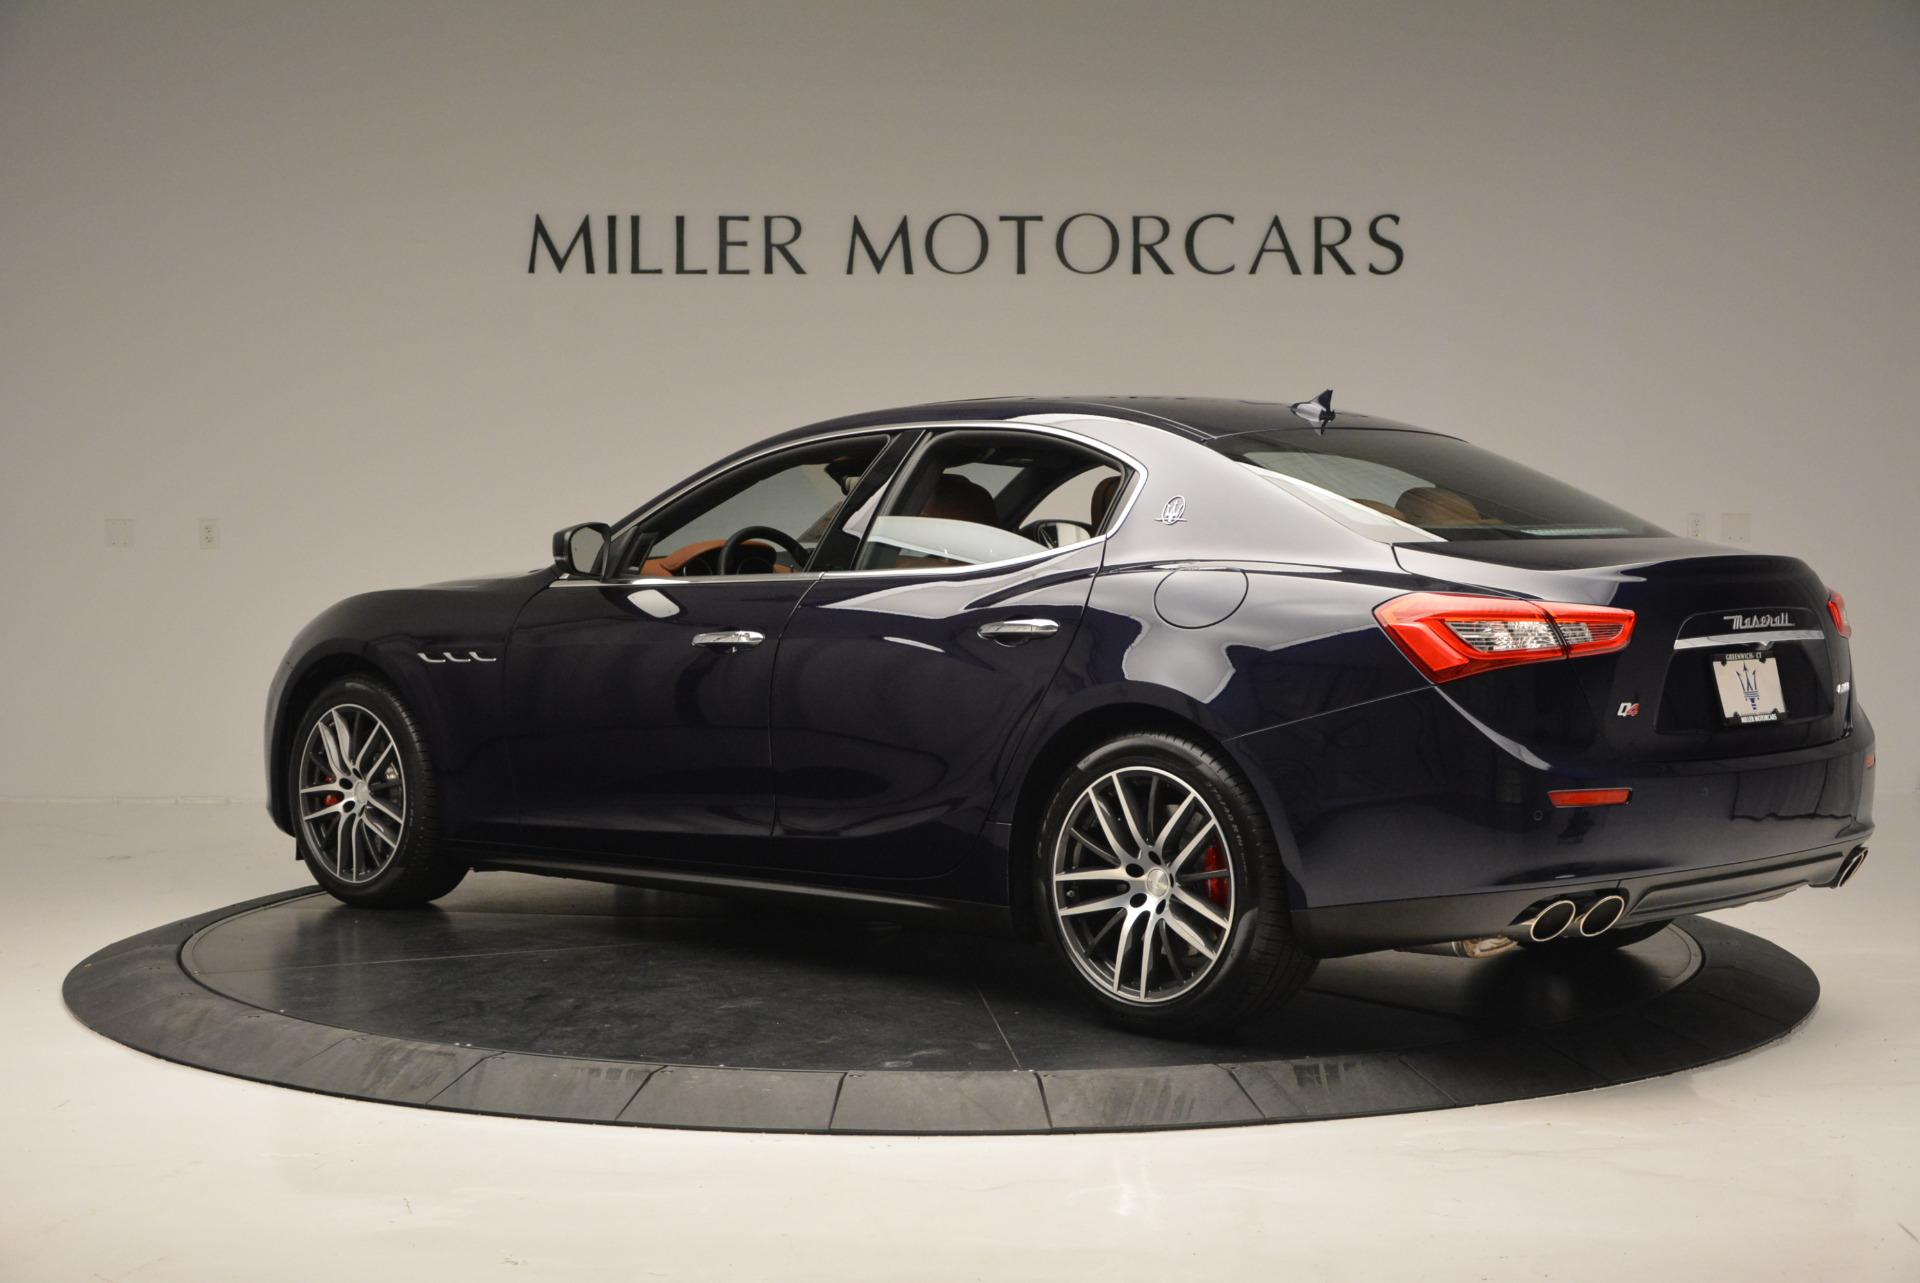 Used 2017 Maserati Ghibli S Q4 - EX Loaner For Sale In Greenwich, CT 568_p4